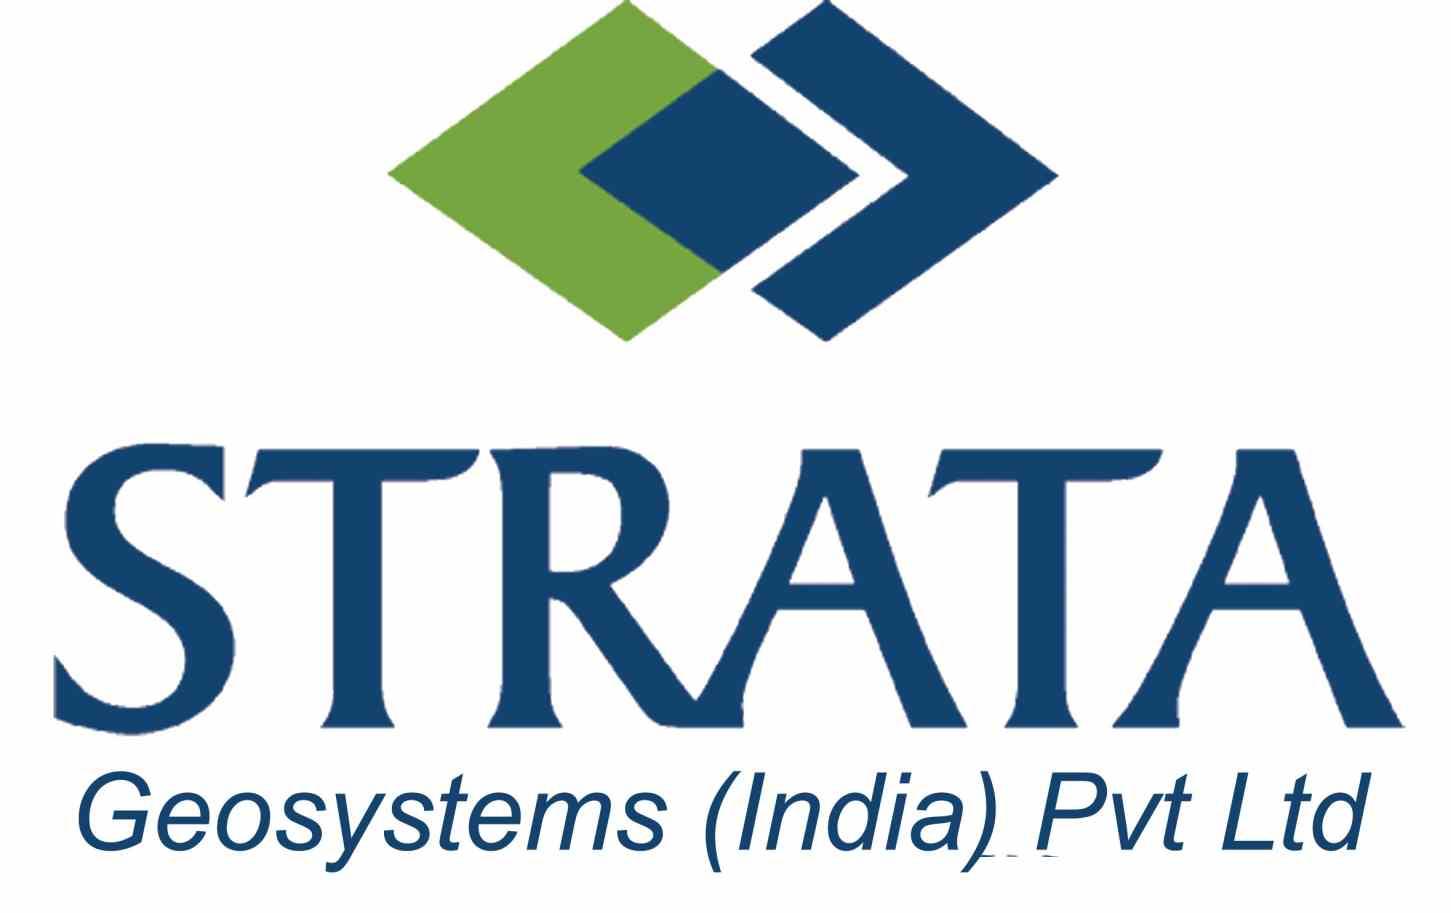 Strata Geosystems (India) Pvt Ltd Logo